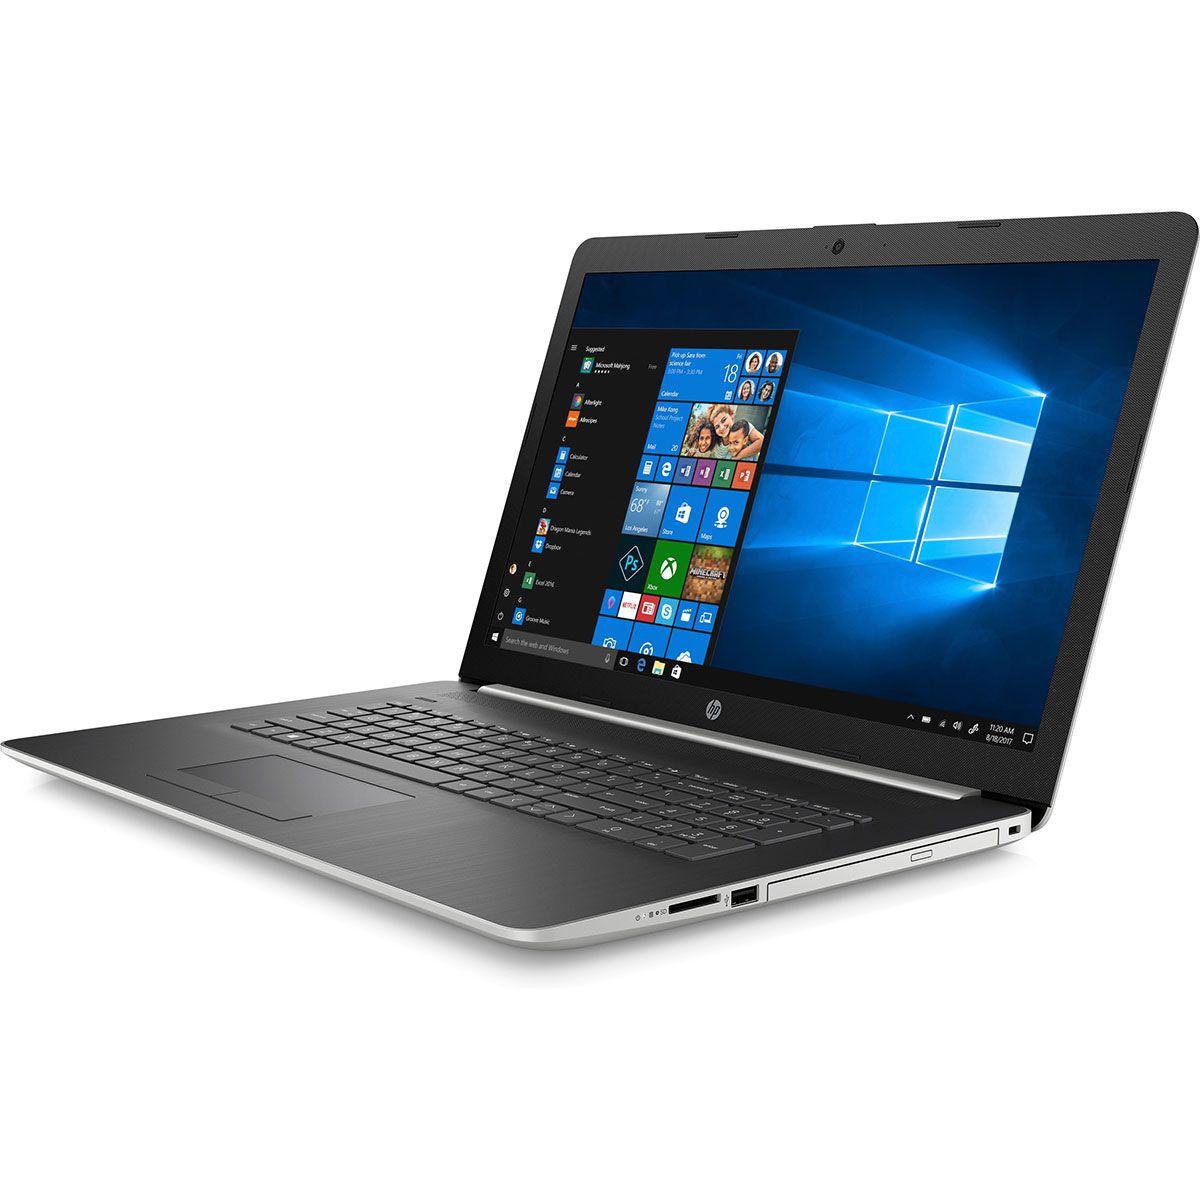 Hp 17 Ca1152ng 9he02ea 173 Fullhd 4390cm 173 Fullhd Amd Ryzen 5 3500u 4x 21ghz 8gb Ram 512gb Ssd Arltcomputer Hp Noteb In 2020 Apple Macbook Pro Computer Ebay